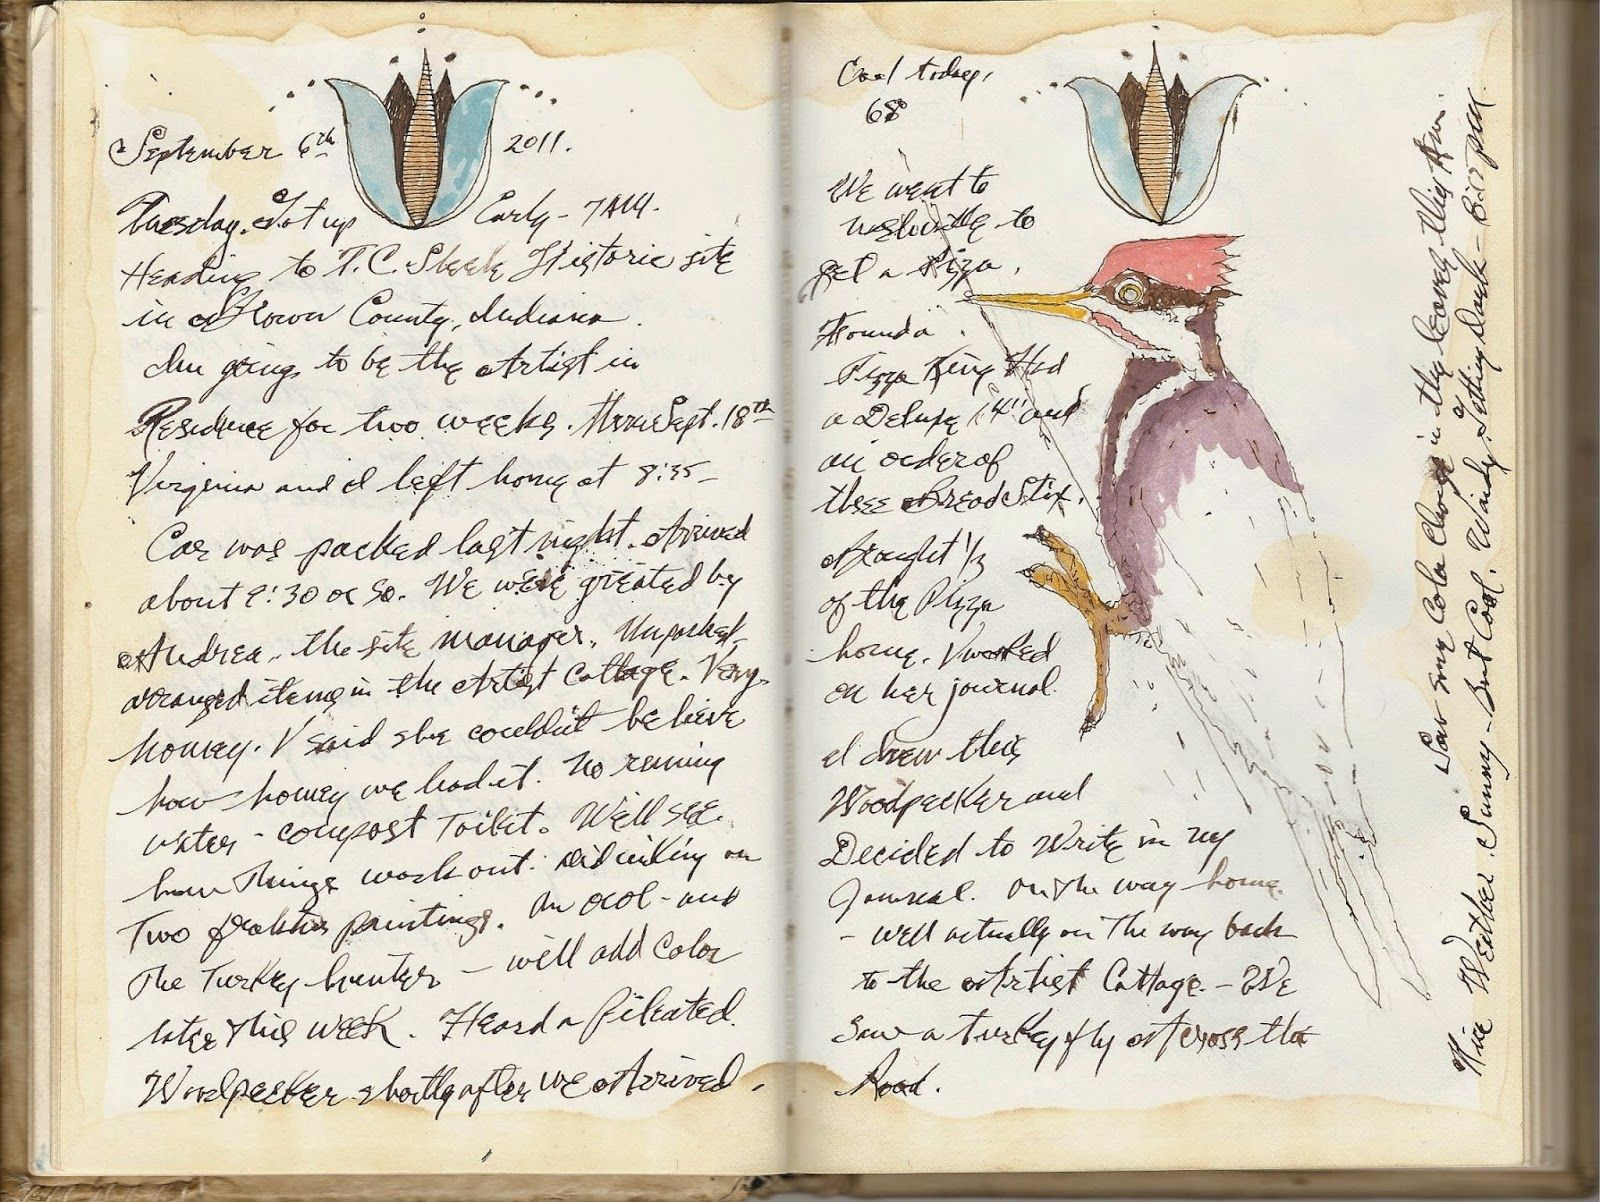 Ken Scott American Frontier Artist  Field journal, Sketchbook